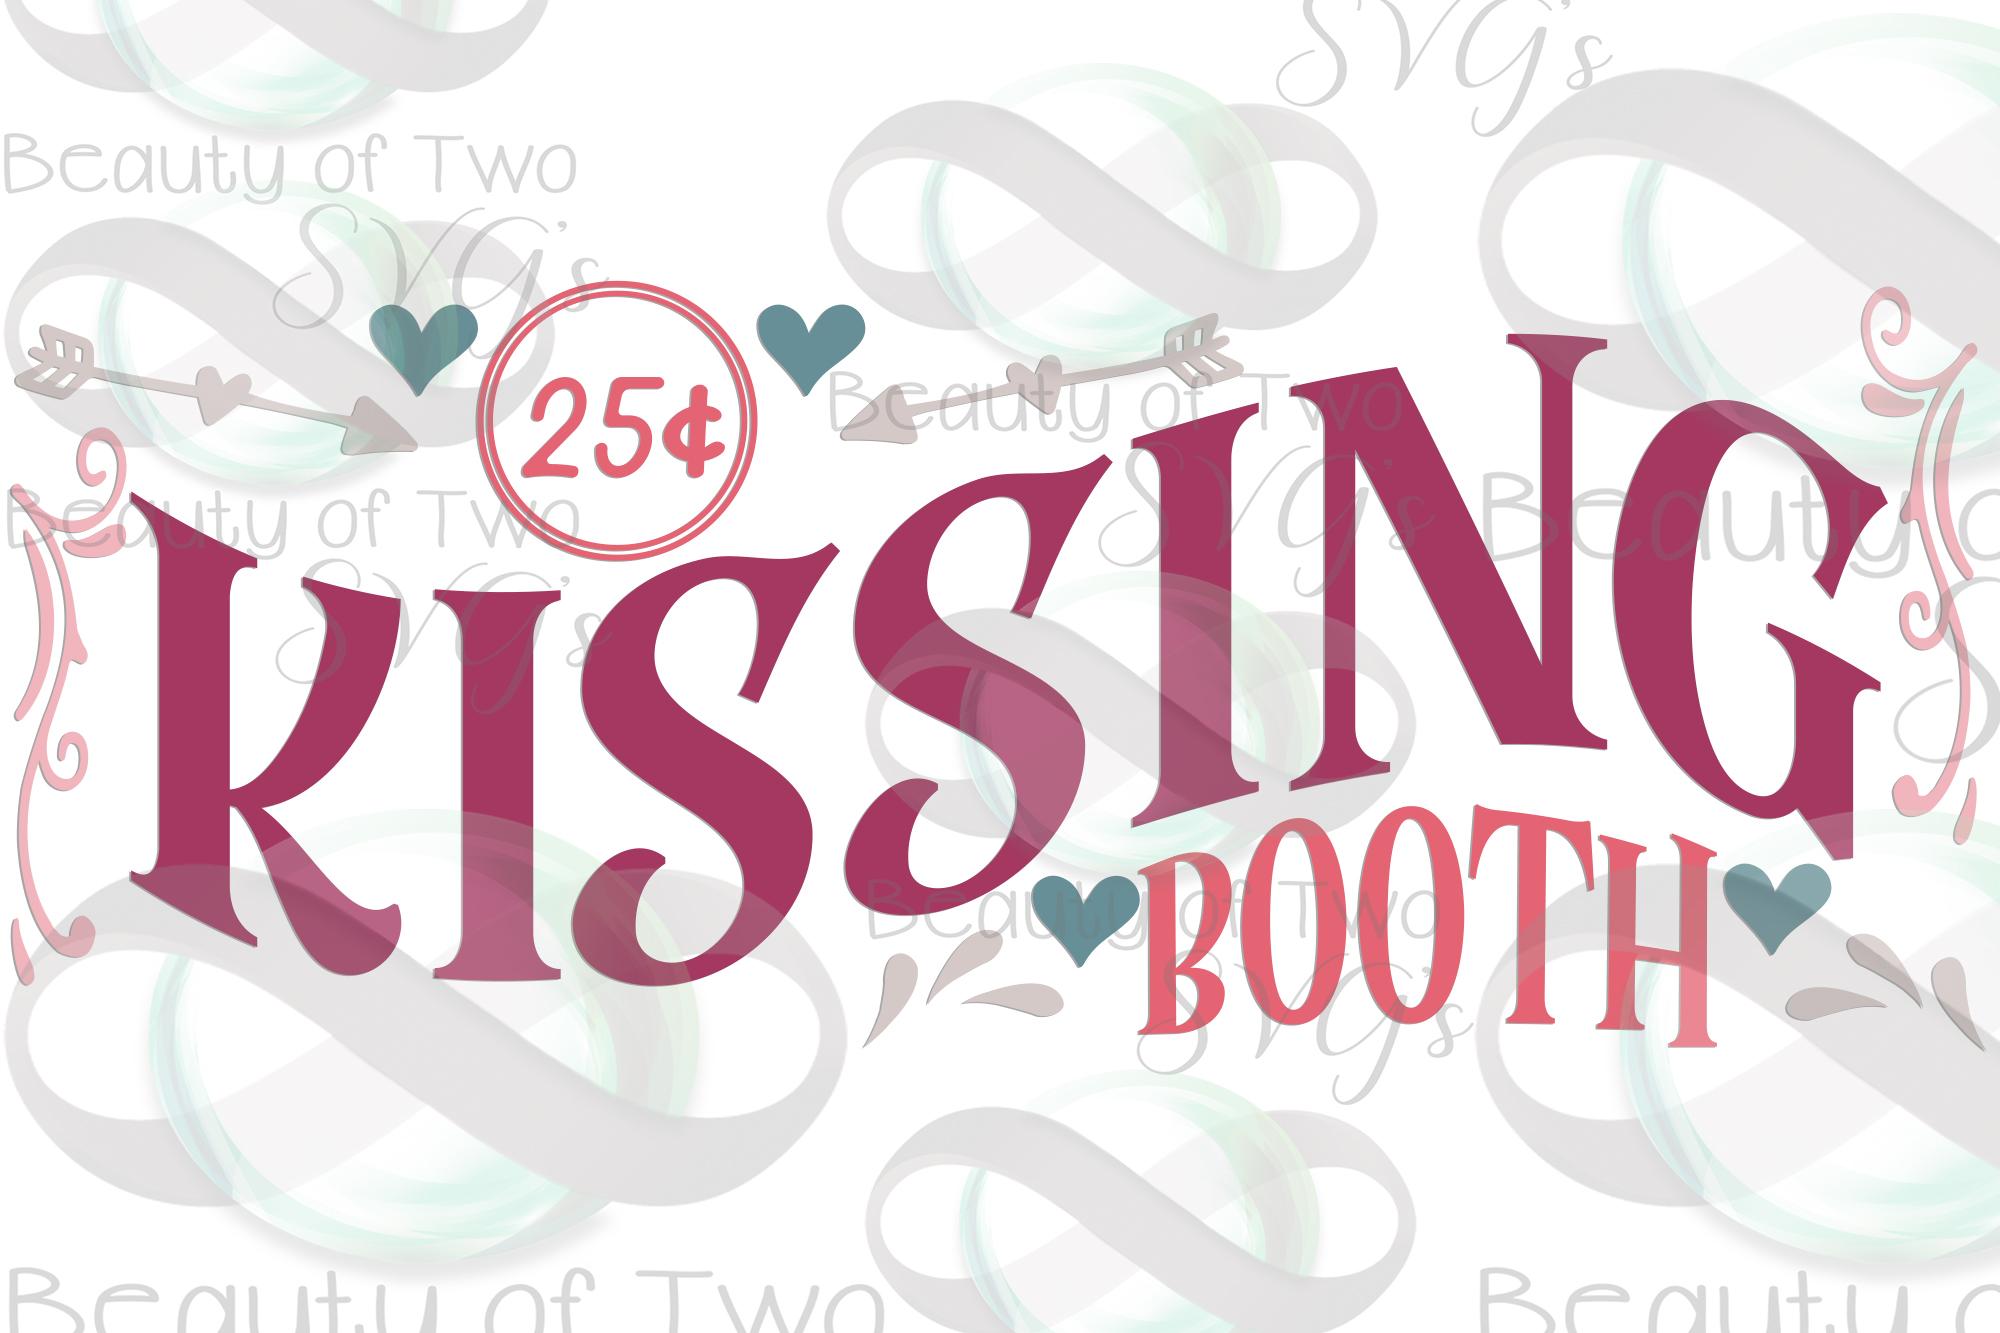 Valentines Kissing Booth svg, Valentines sign design svg example image 2